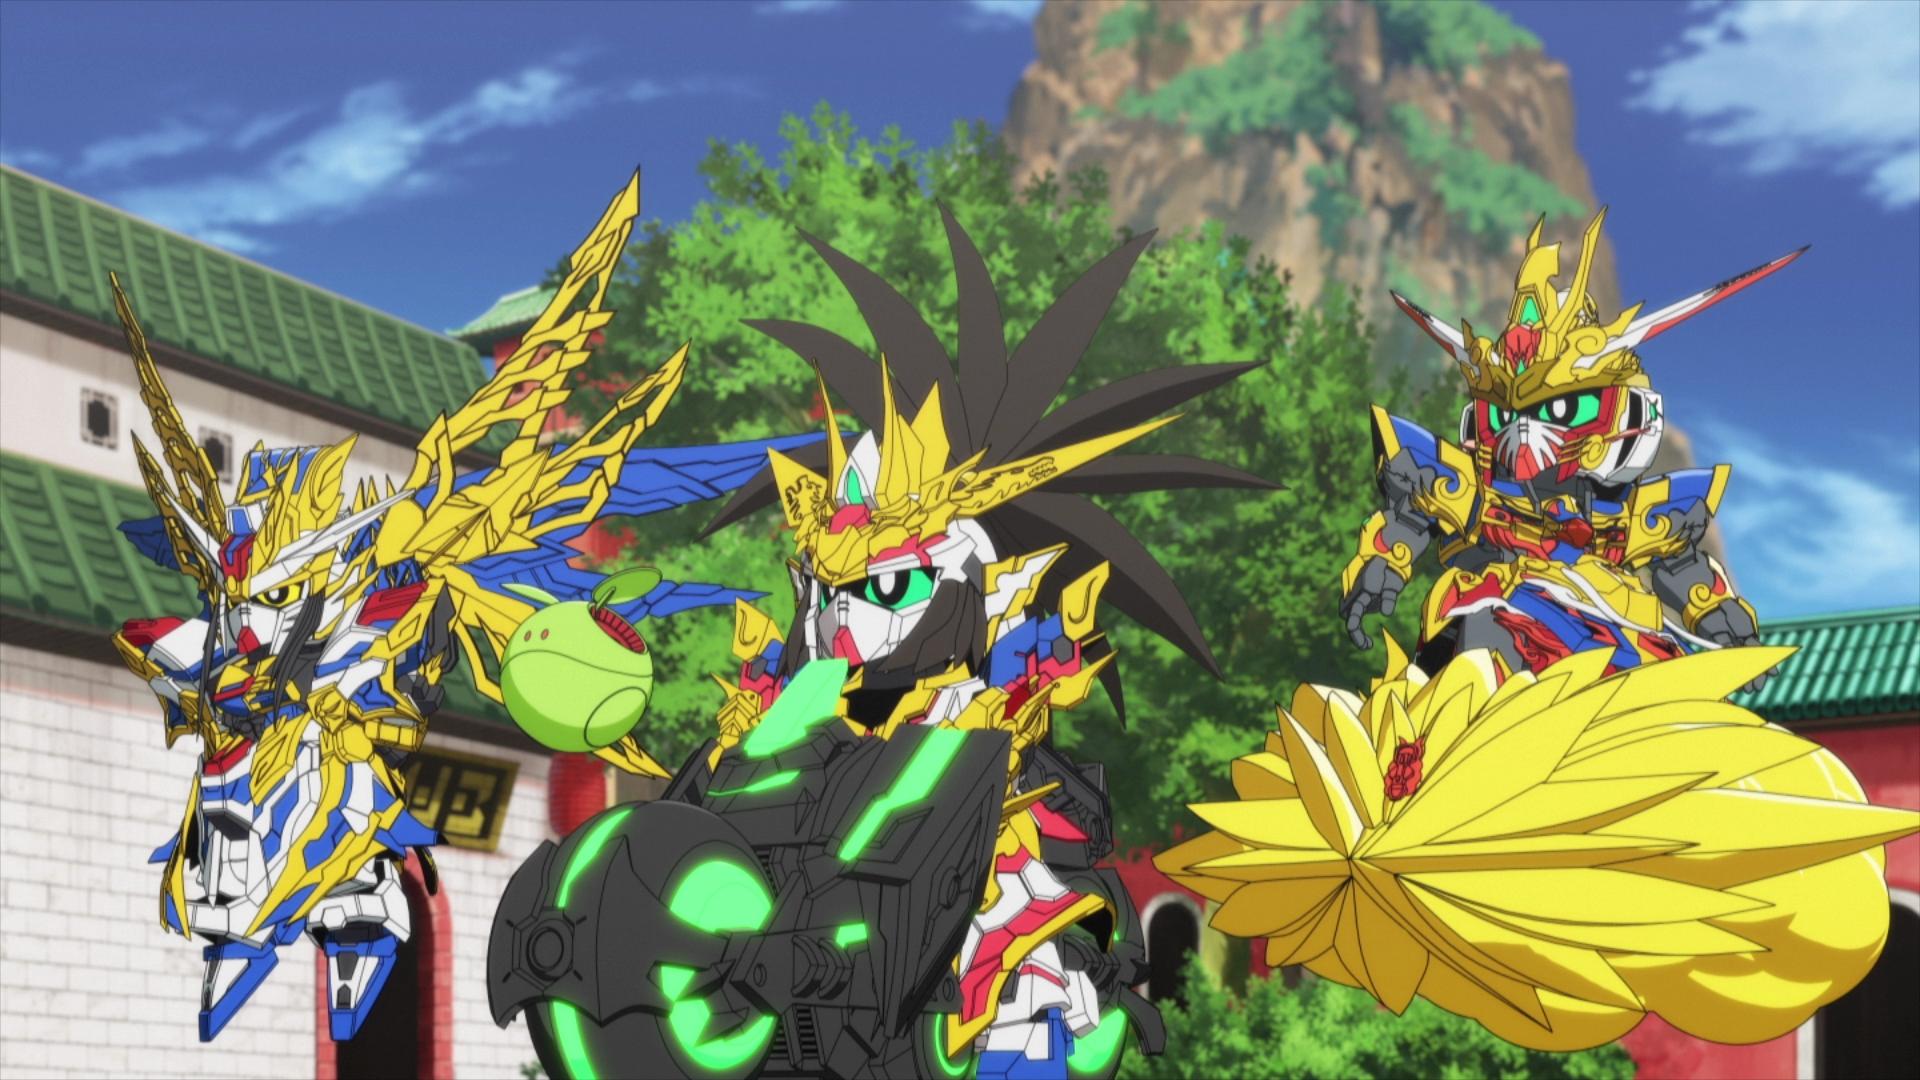 SD GUNDAM WORLD HEROES - Episode 2